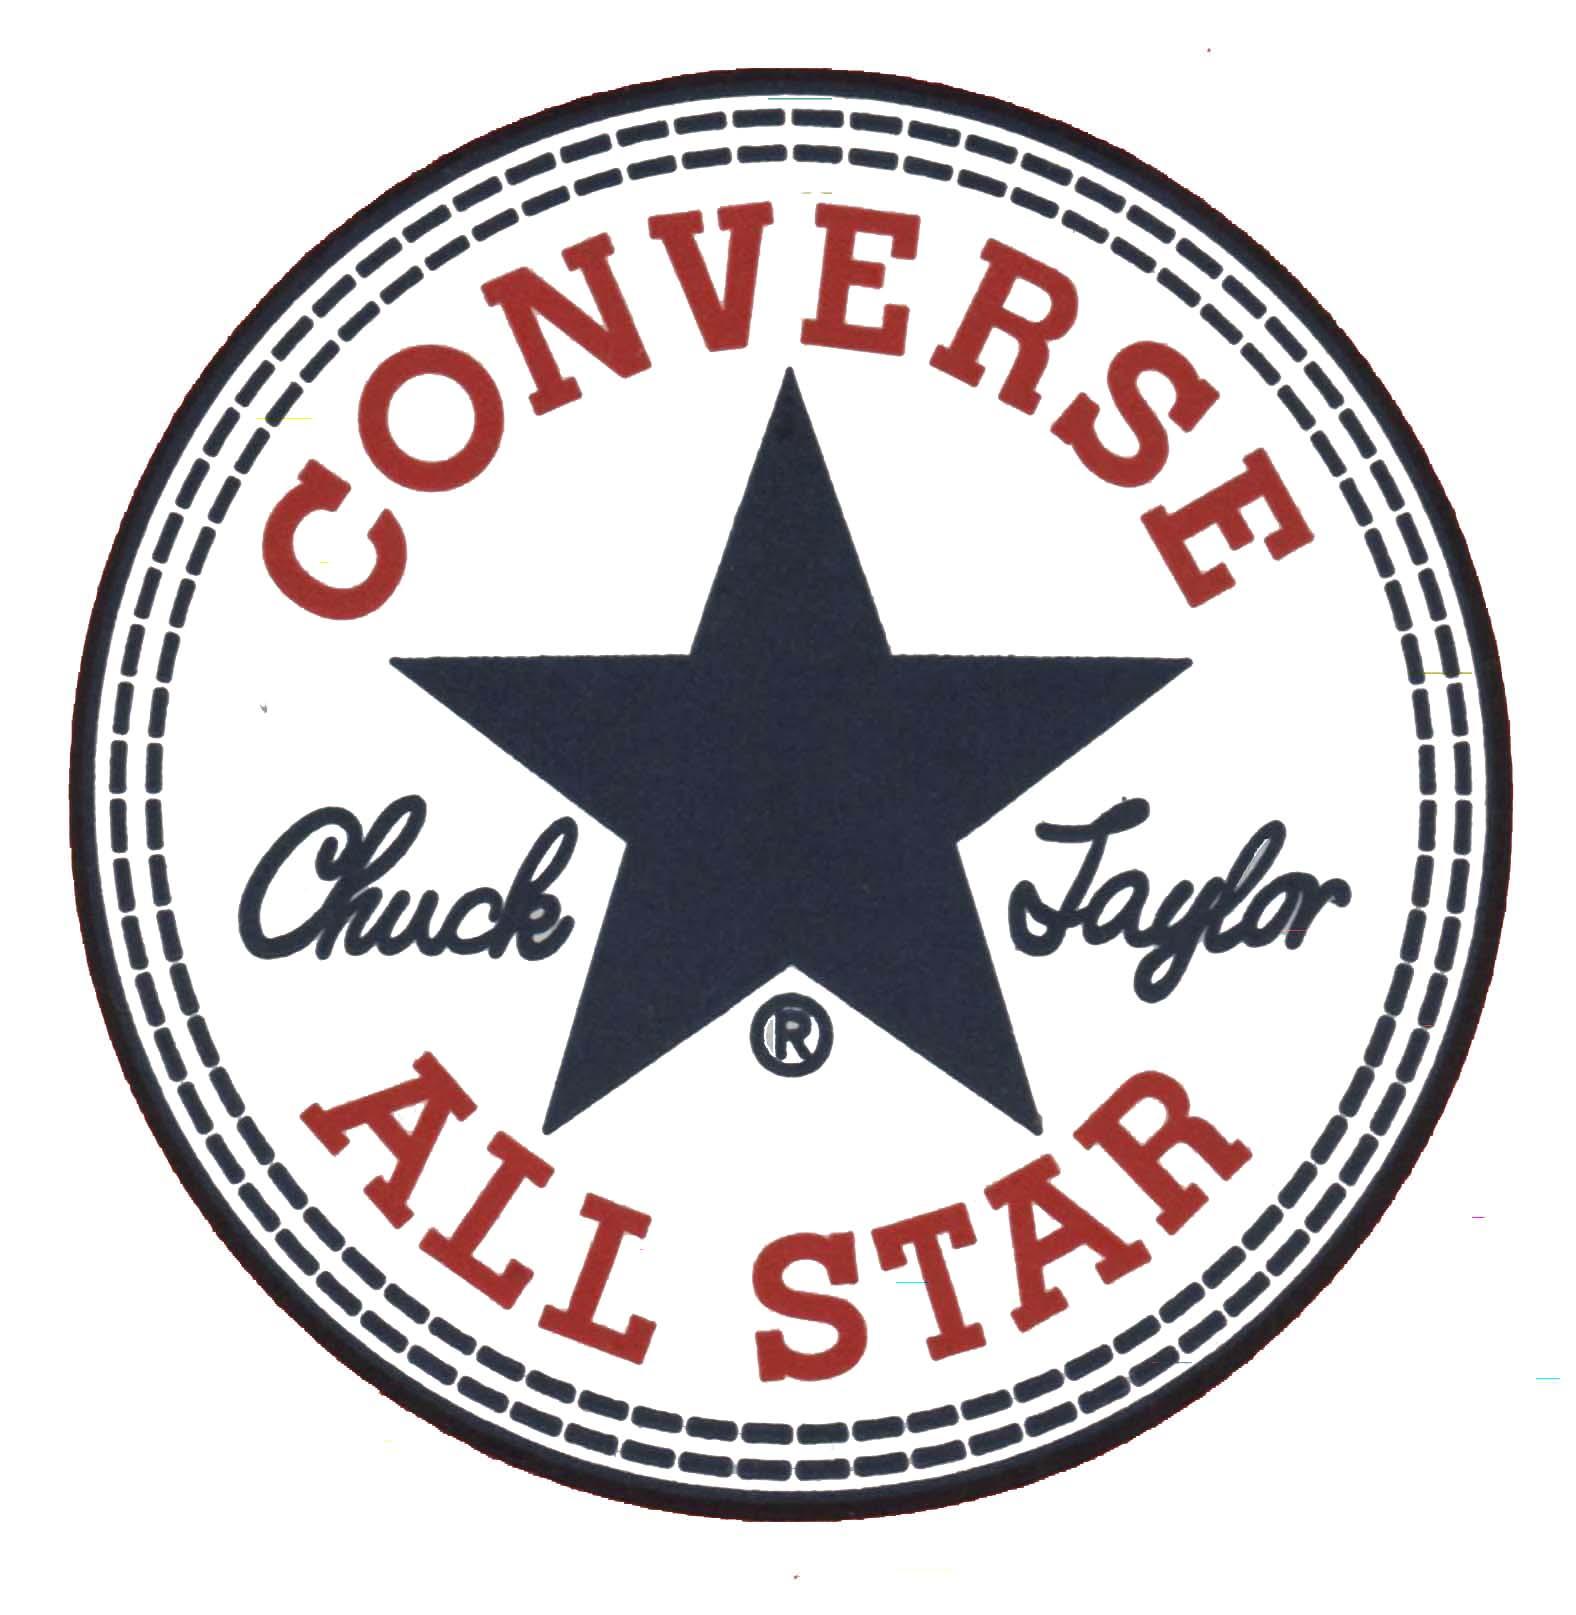 f96603e9ebaa82 1970-present. Converse chuck taylor all star